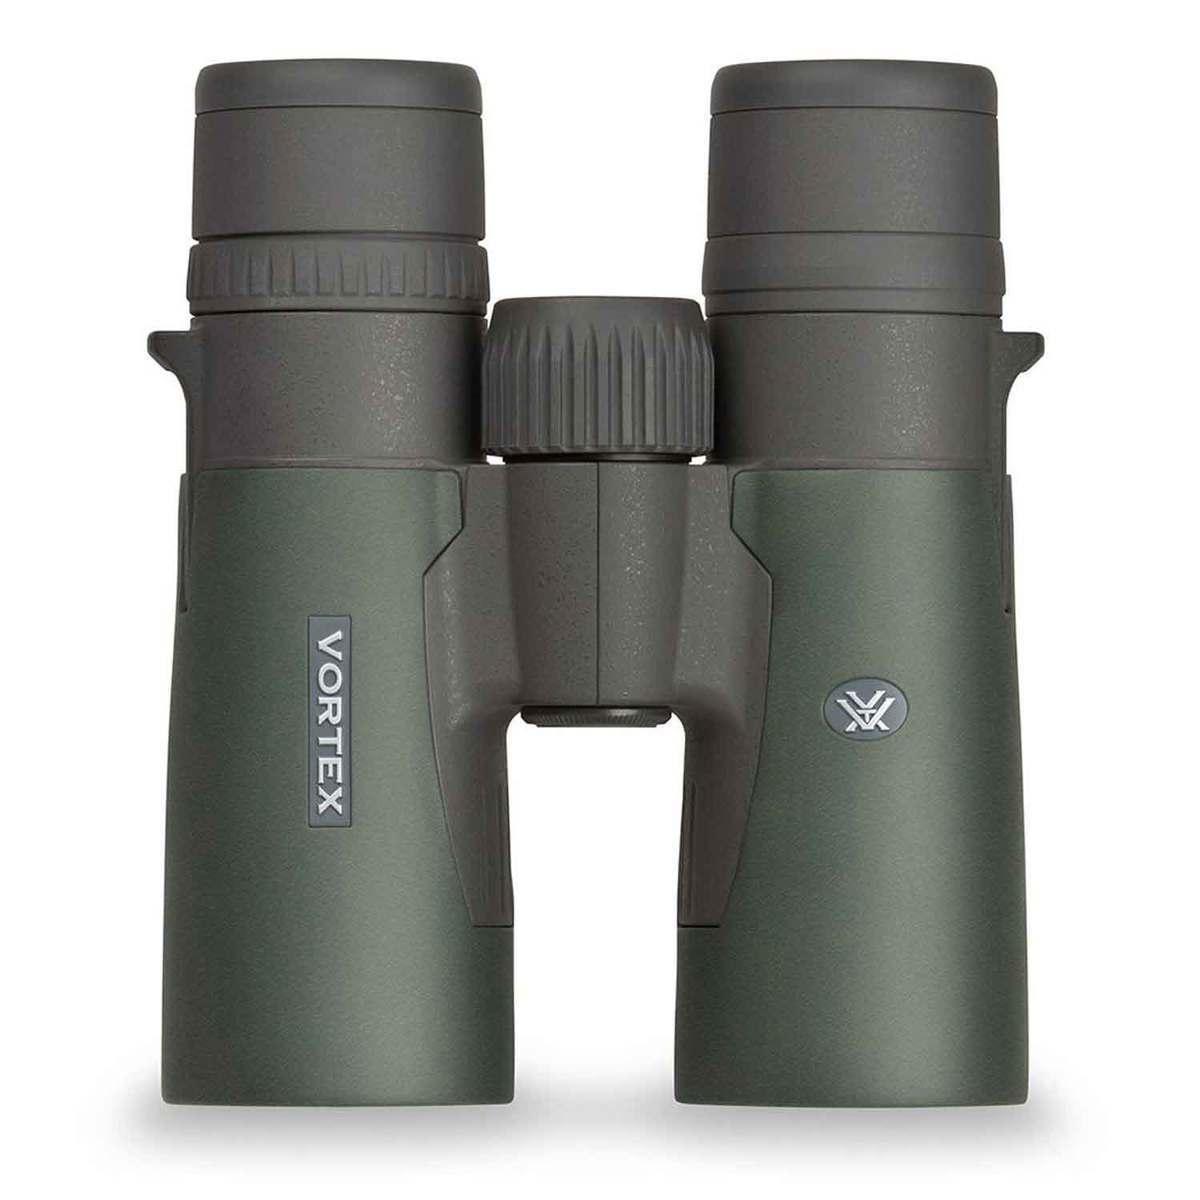 Vortex Razor HD Full Size Binoculars - 10x42